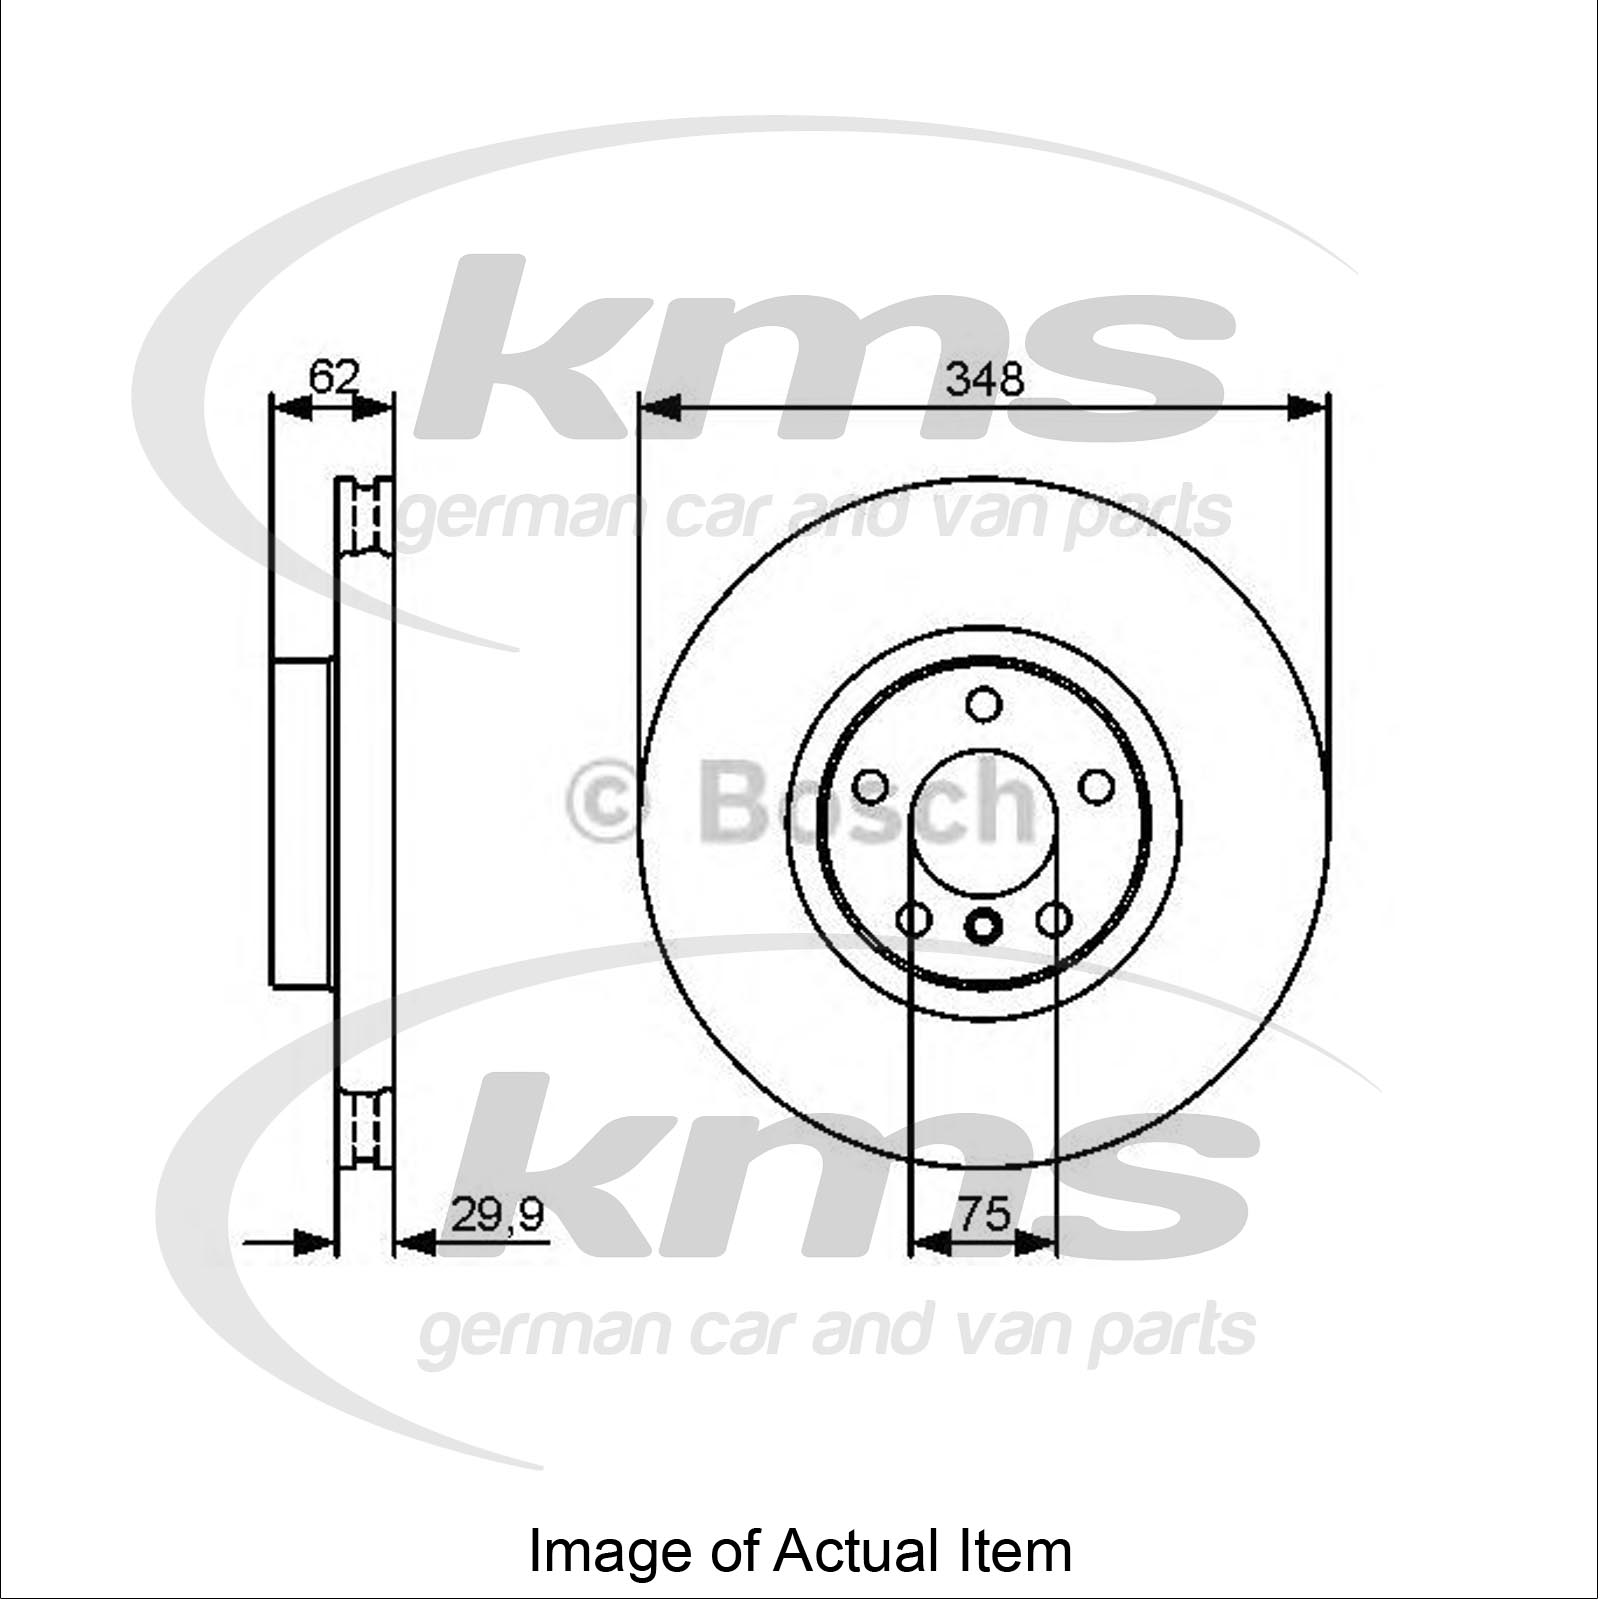 Brake Disc Bmw X5 E70 3 0 D Closed Off Road Vehicle 211